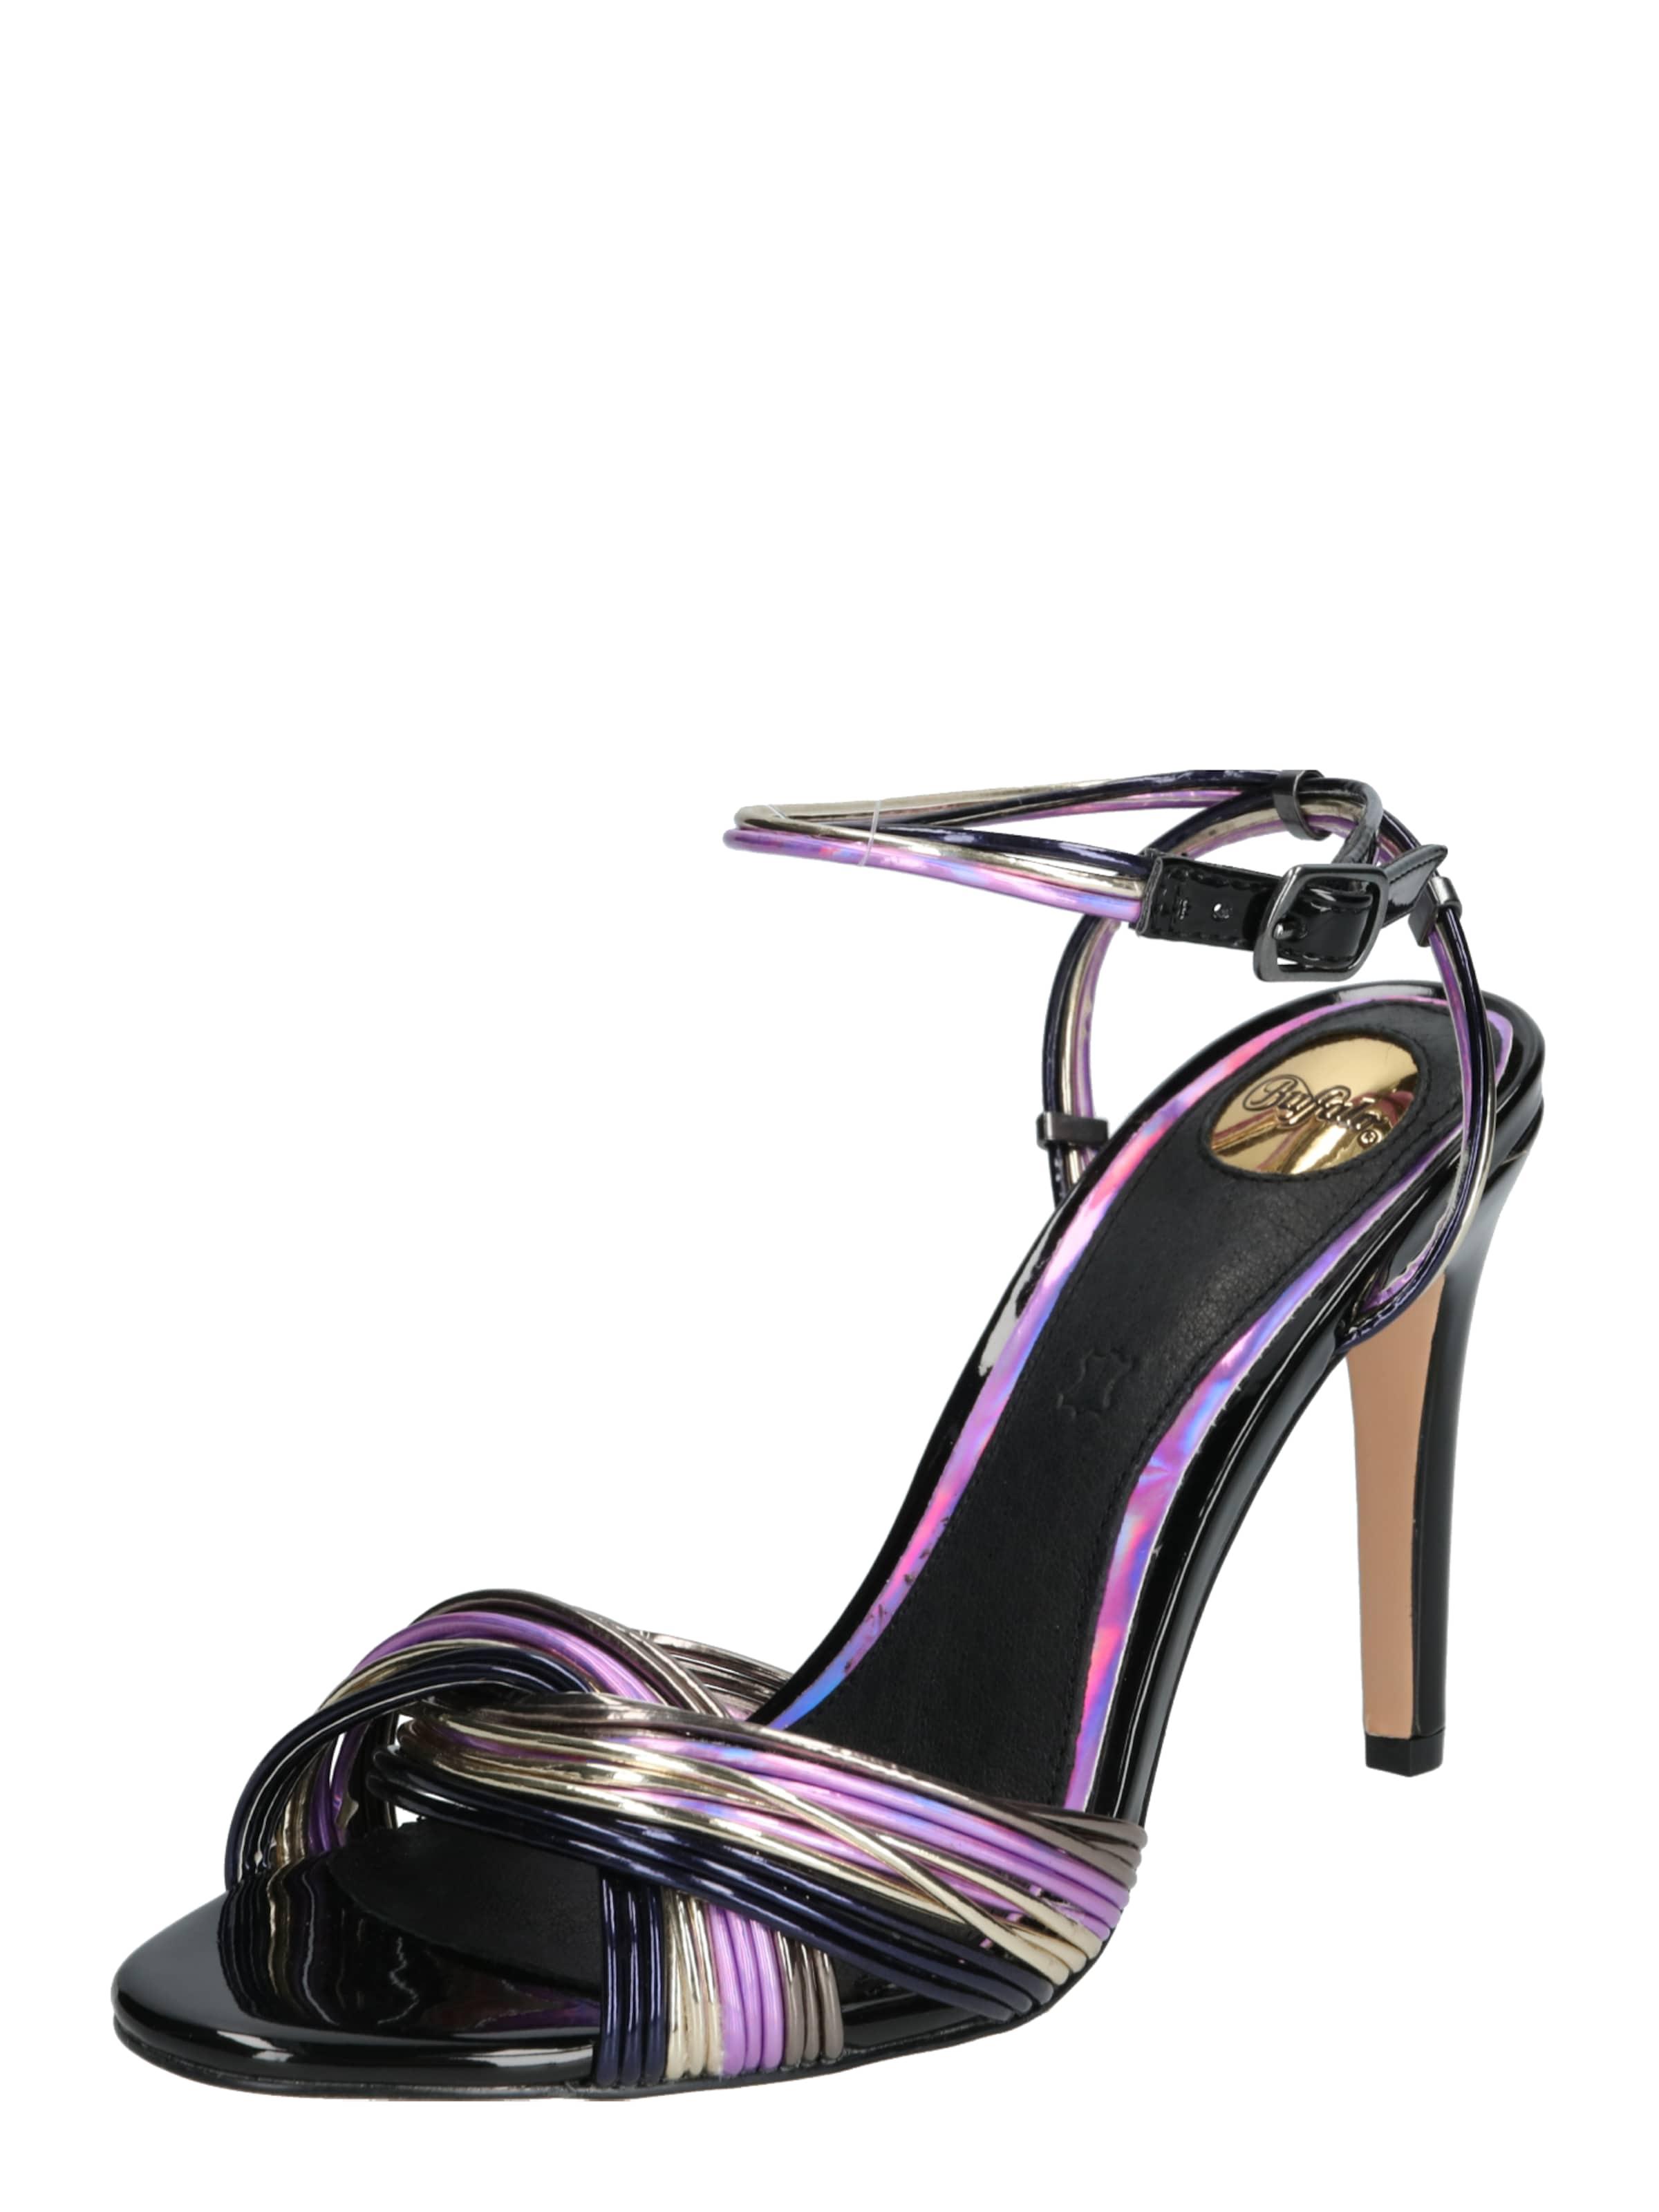 BUFFALO High Heels 'FLORIN' in blau   lila   schwarz